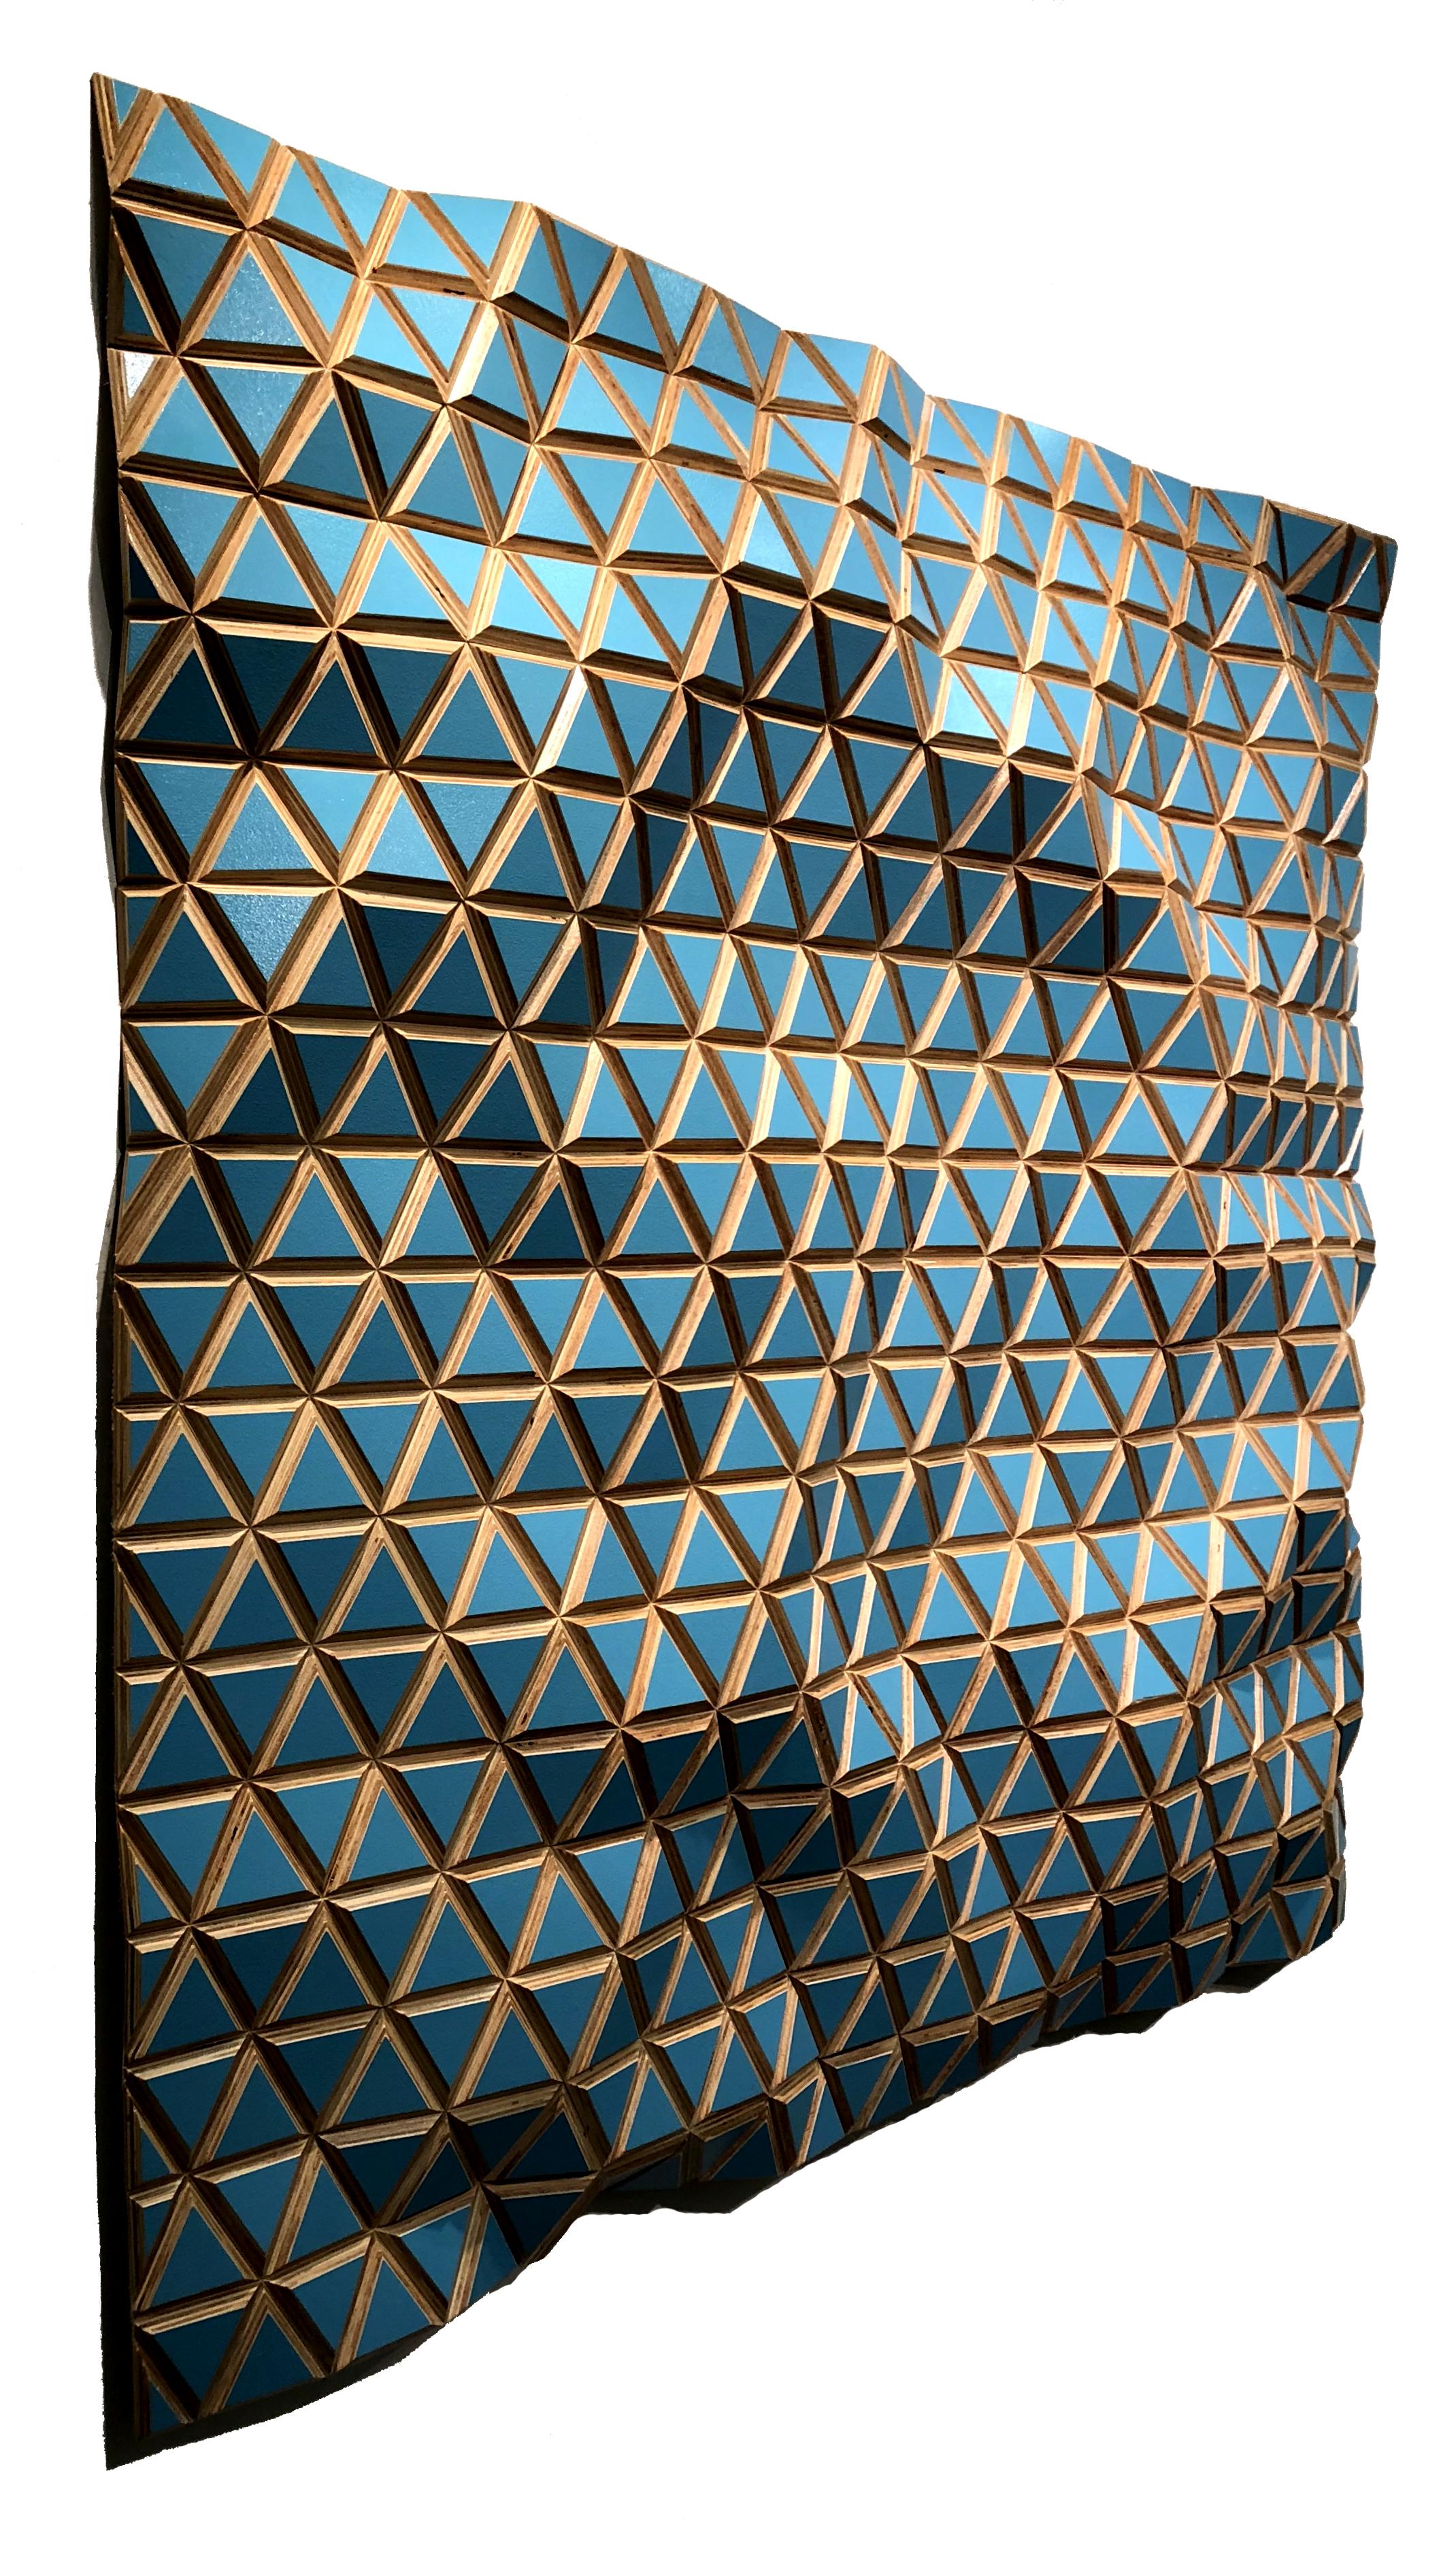 HGU_Flexible Rigids-Morphos Peleides_57x59in_144x150cm_L1.jpg